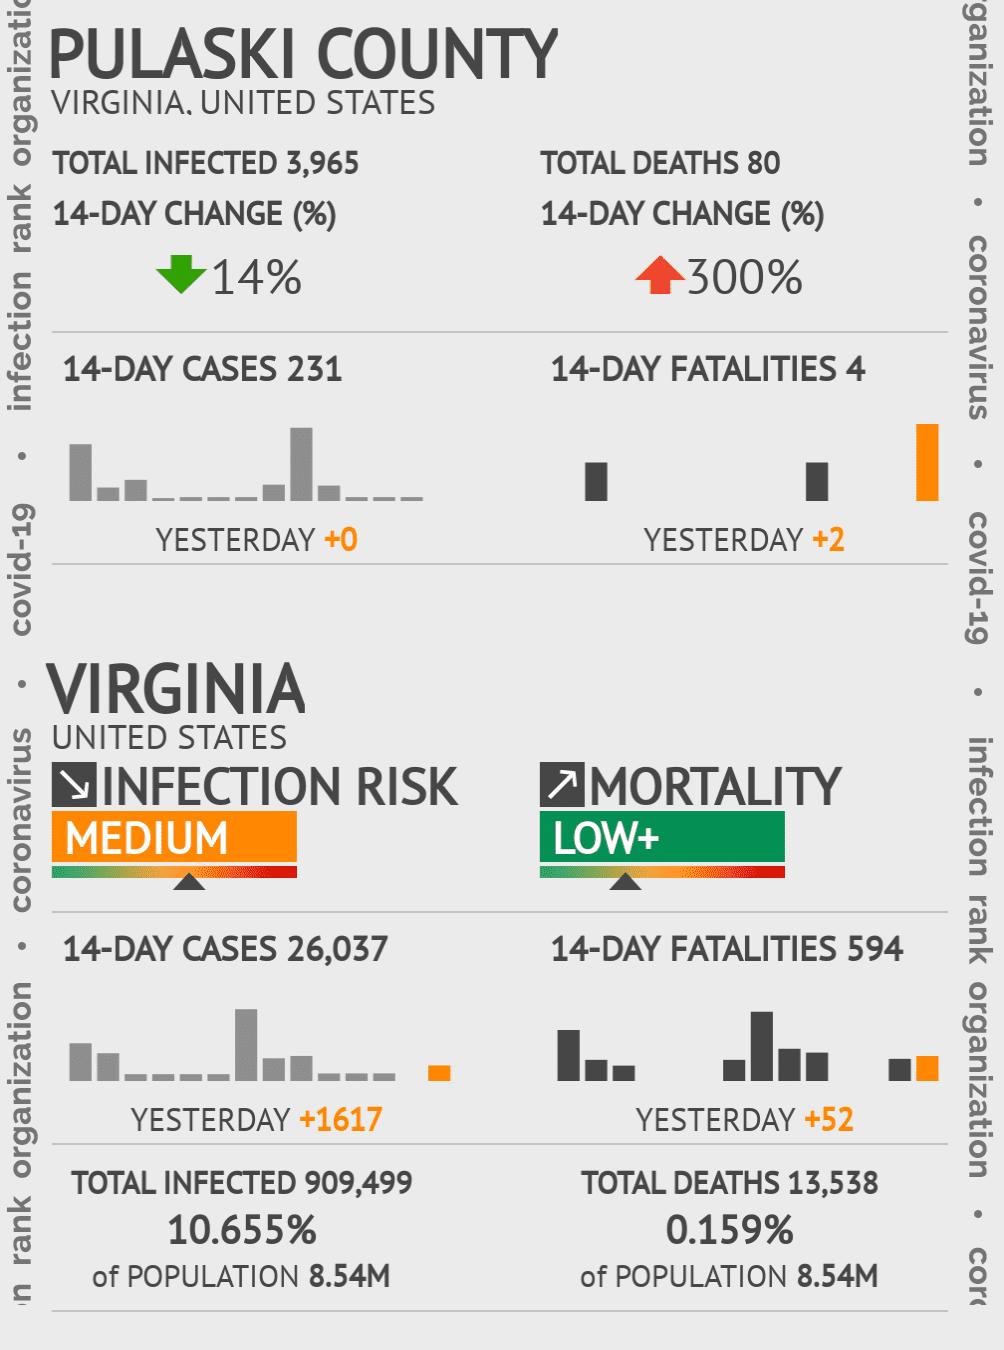 Pulaski County Coronavirus Covid-19 Risk of Infection on July 24, 2021